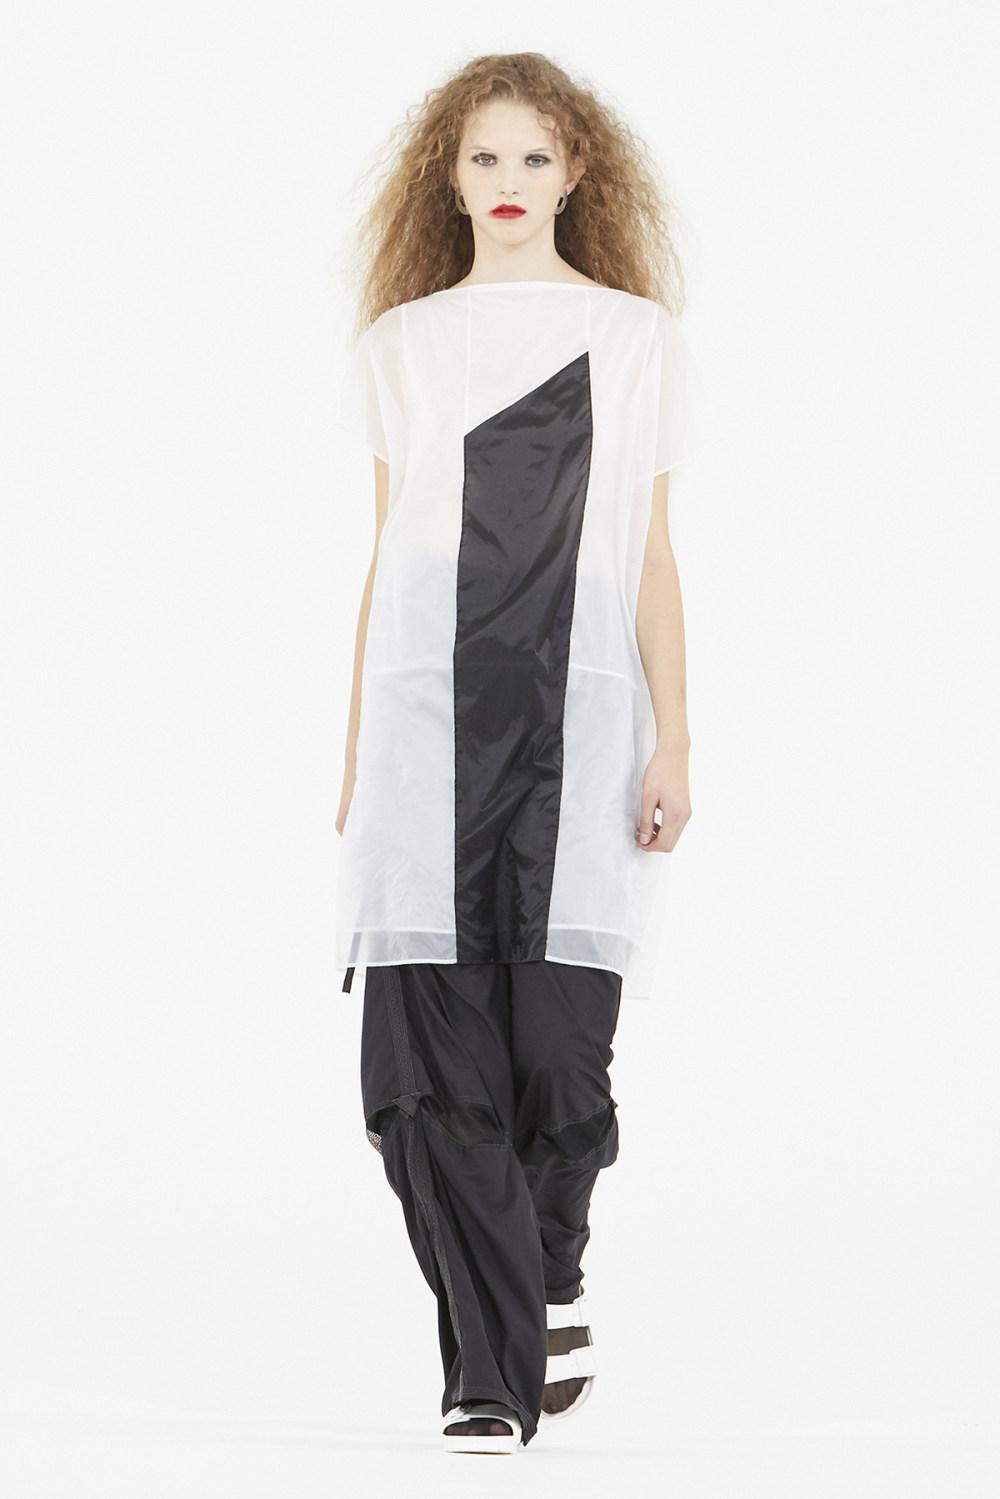 Nicolas Andreas Taralis时装系列技术织物矩形条纹被缝合在一起-6.jpg